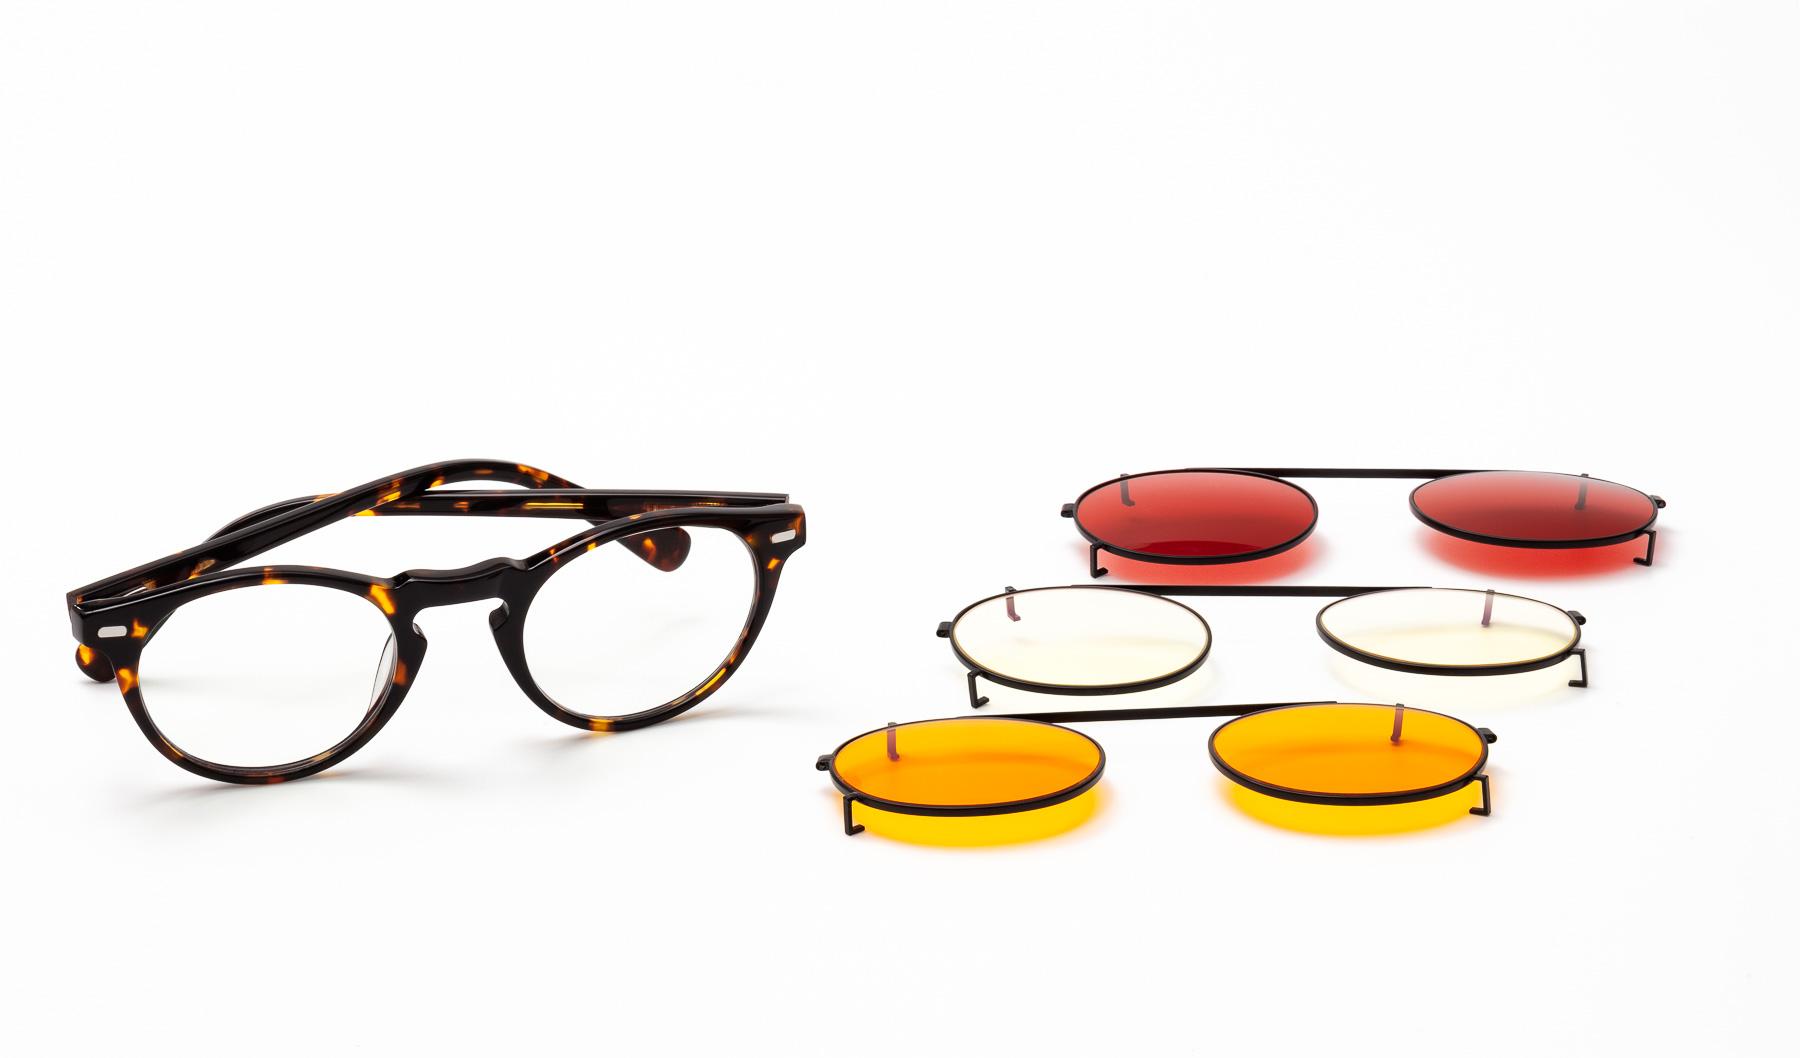 Barkley_Eyewear Main Round Tortoise Shell